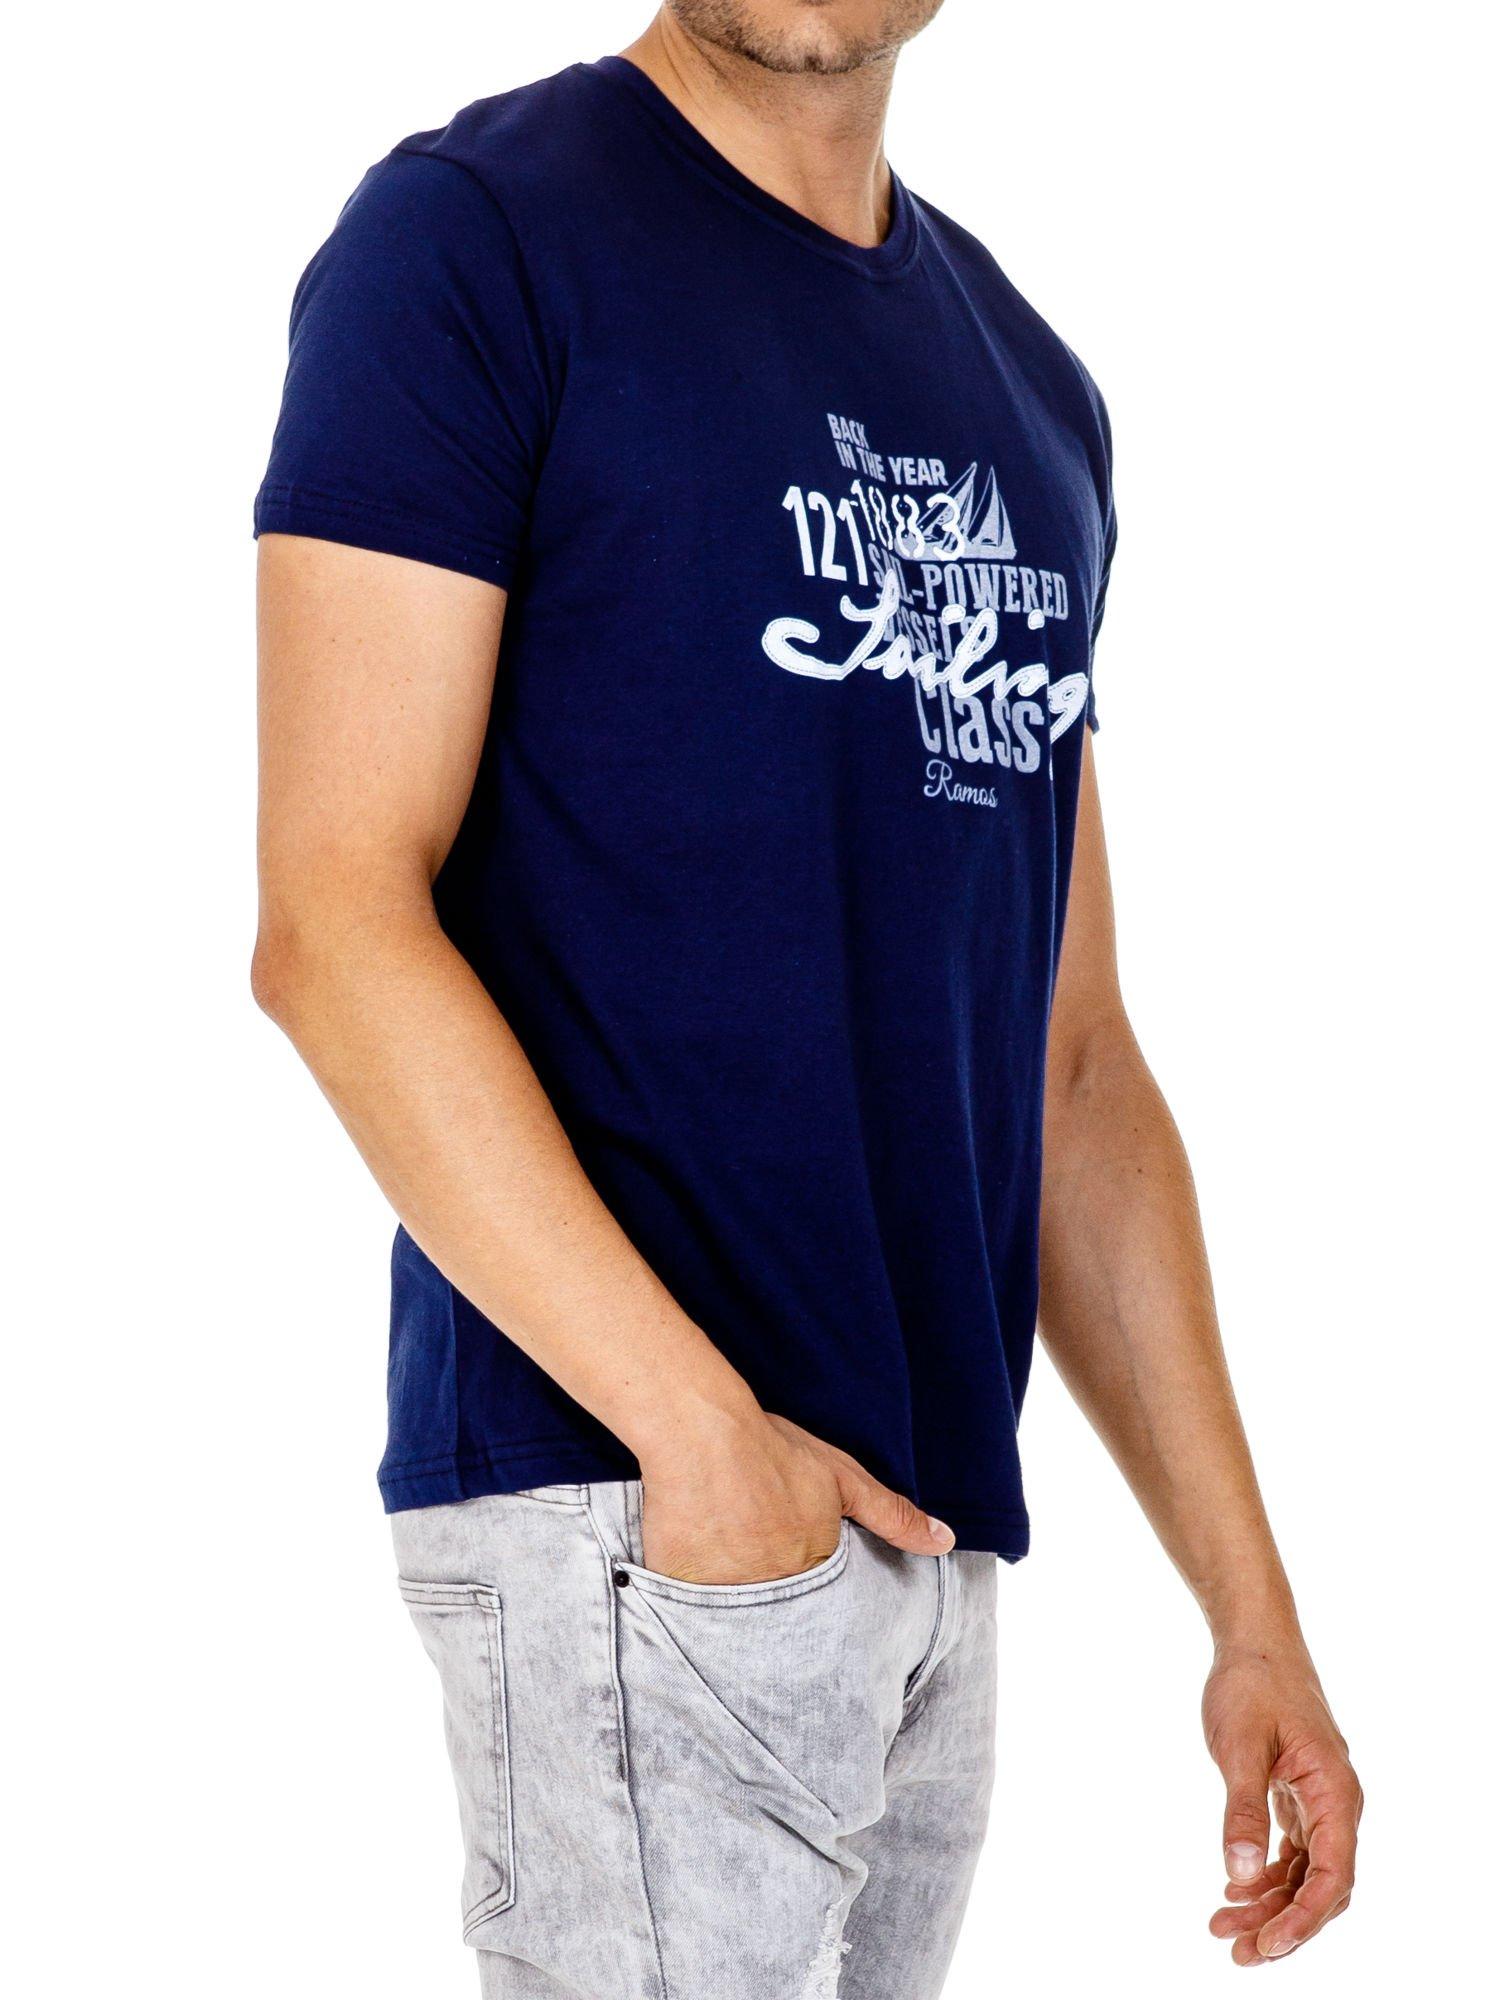 Granatowy t-shirt męski z marynarskim motywem i napisem SAILING                                  zdj.                                  4